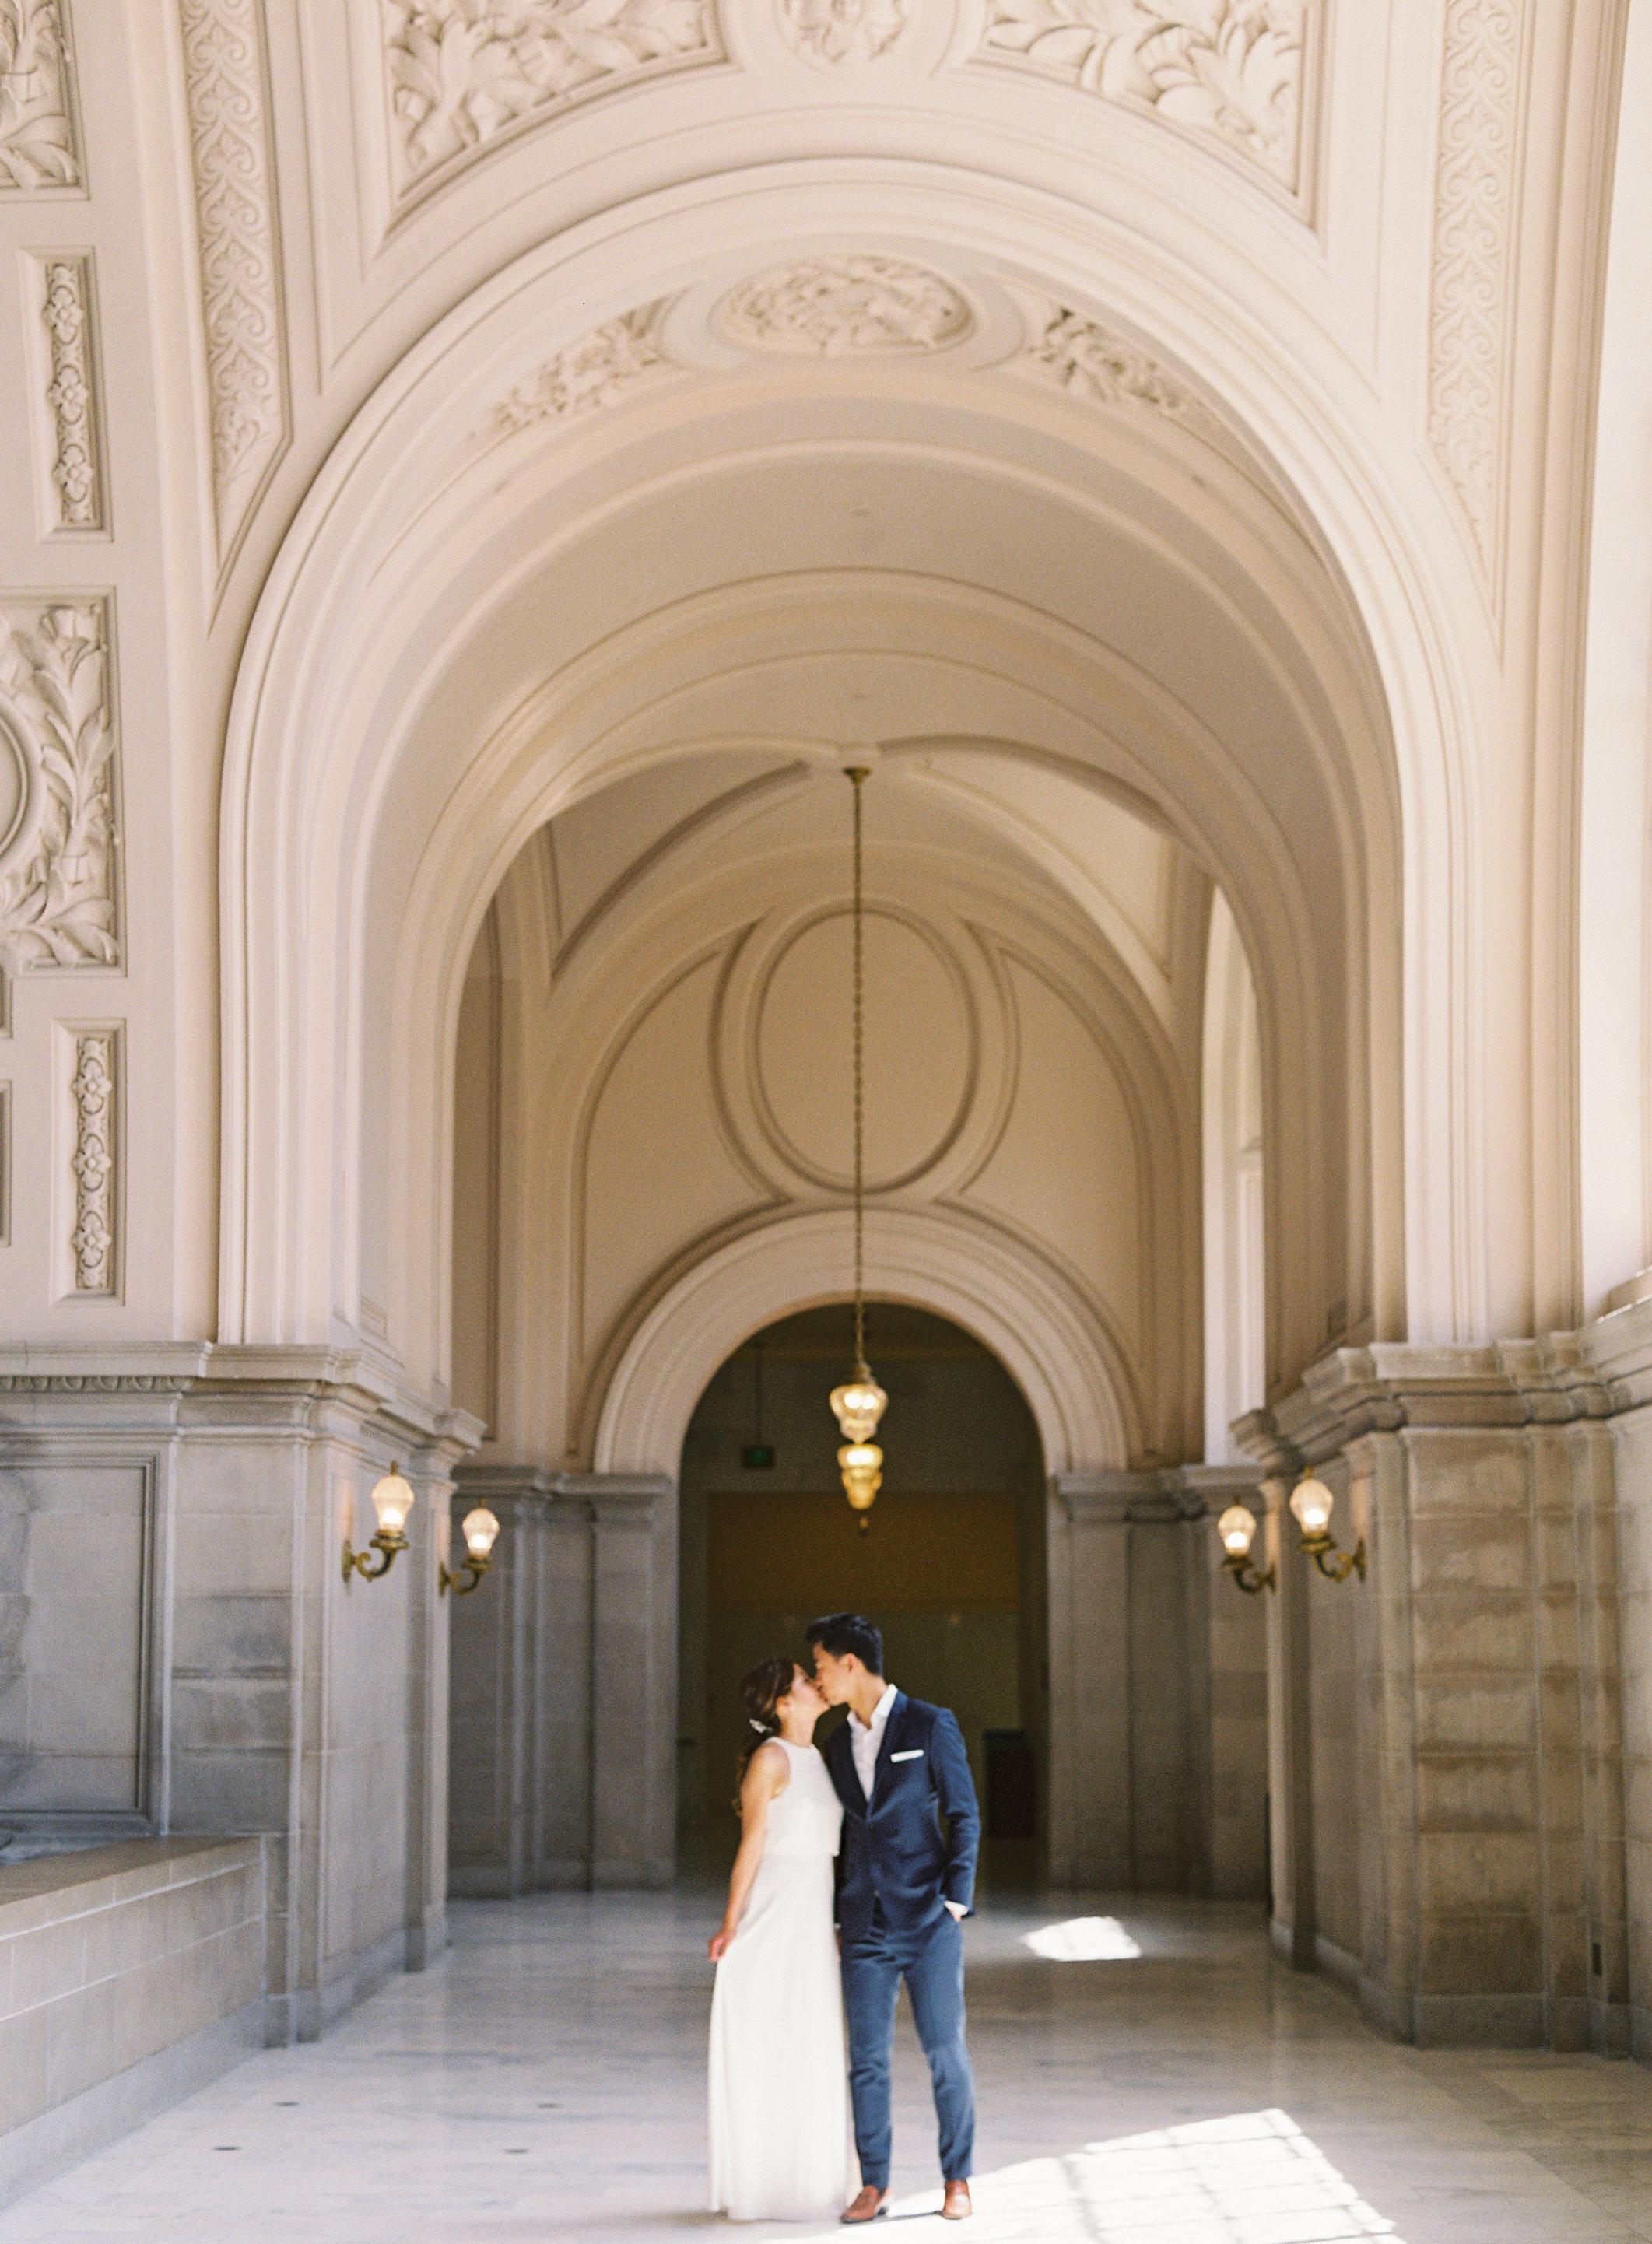 San-francisco-city-hall-photography-wedding-044.jpg